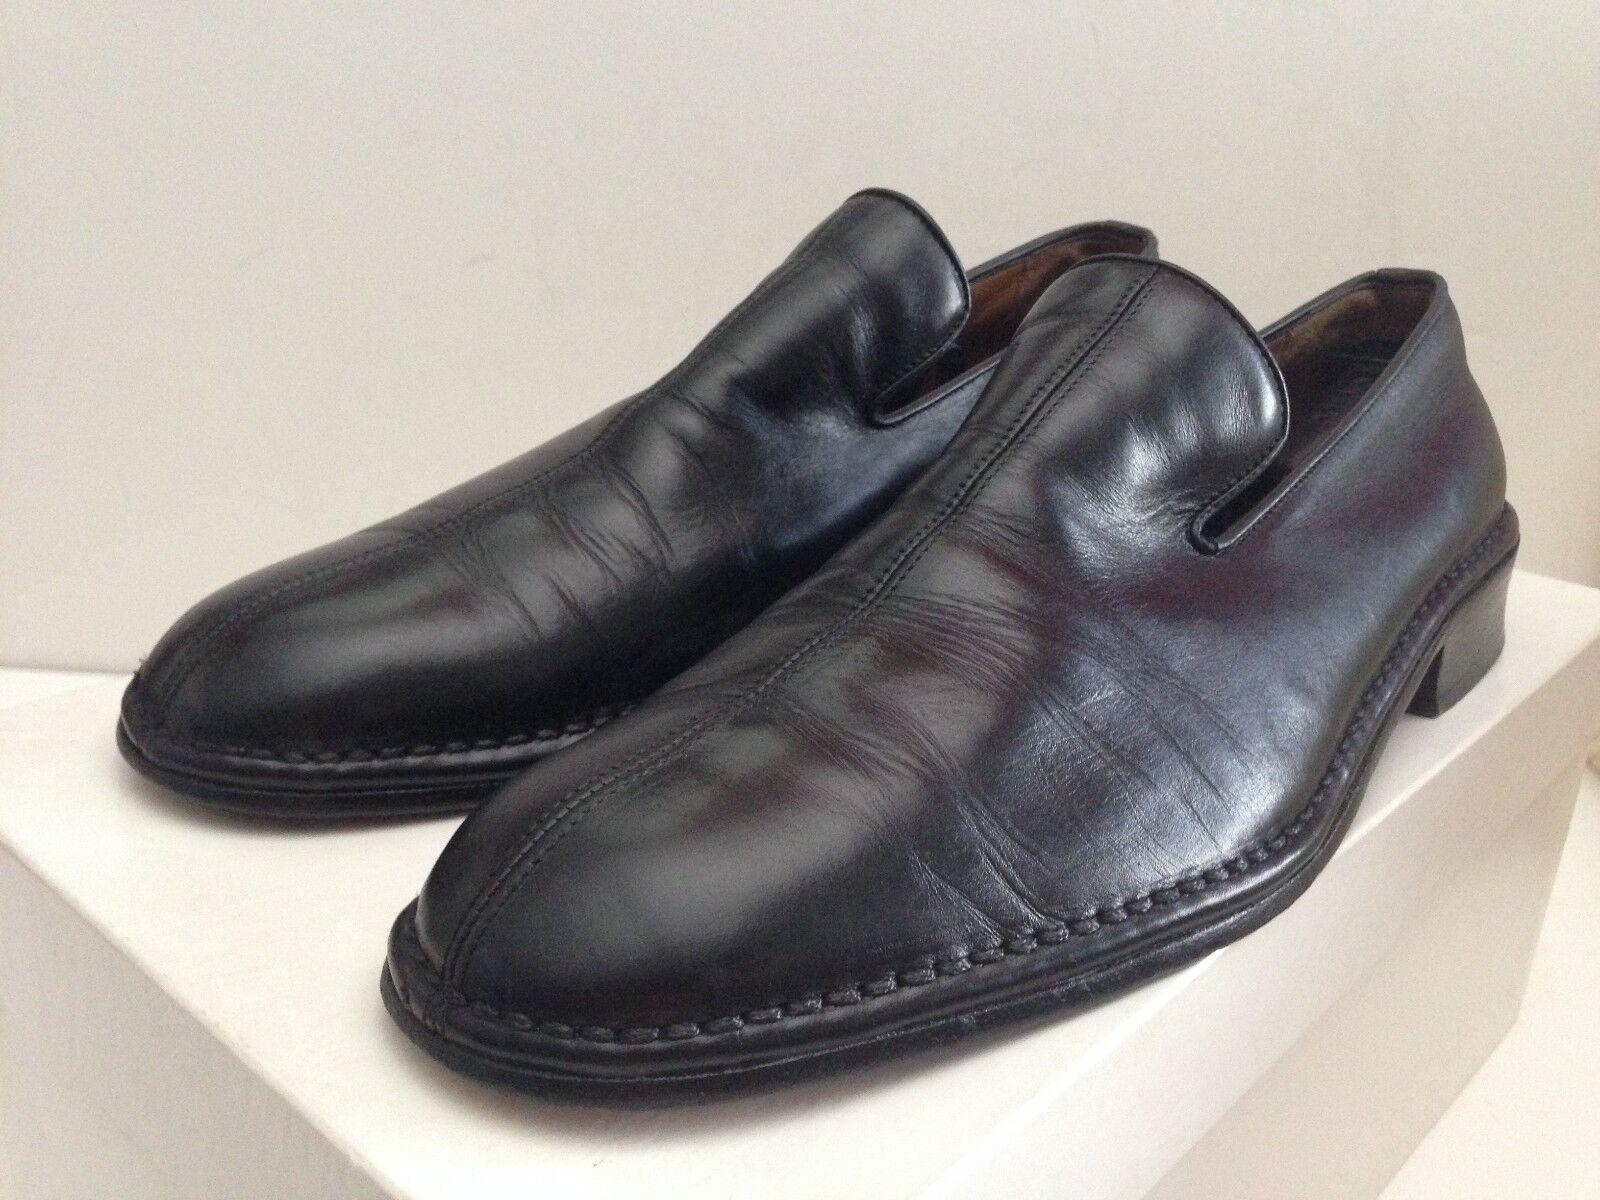 John Varvatos Para Hombre Negro antideslizante en mocasines calzado hecho a mano en Italia Talla 11.5